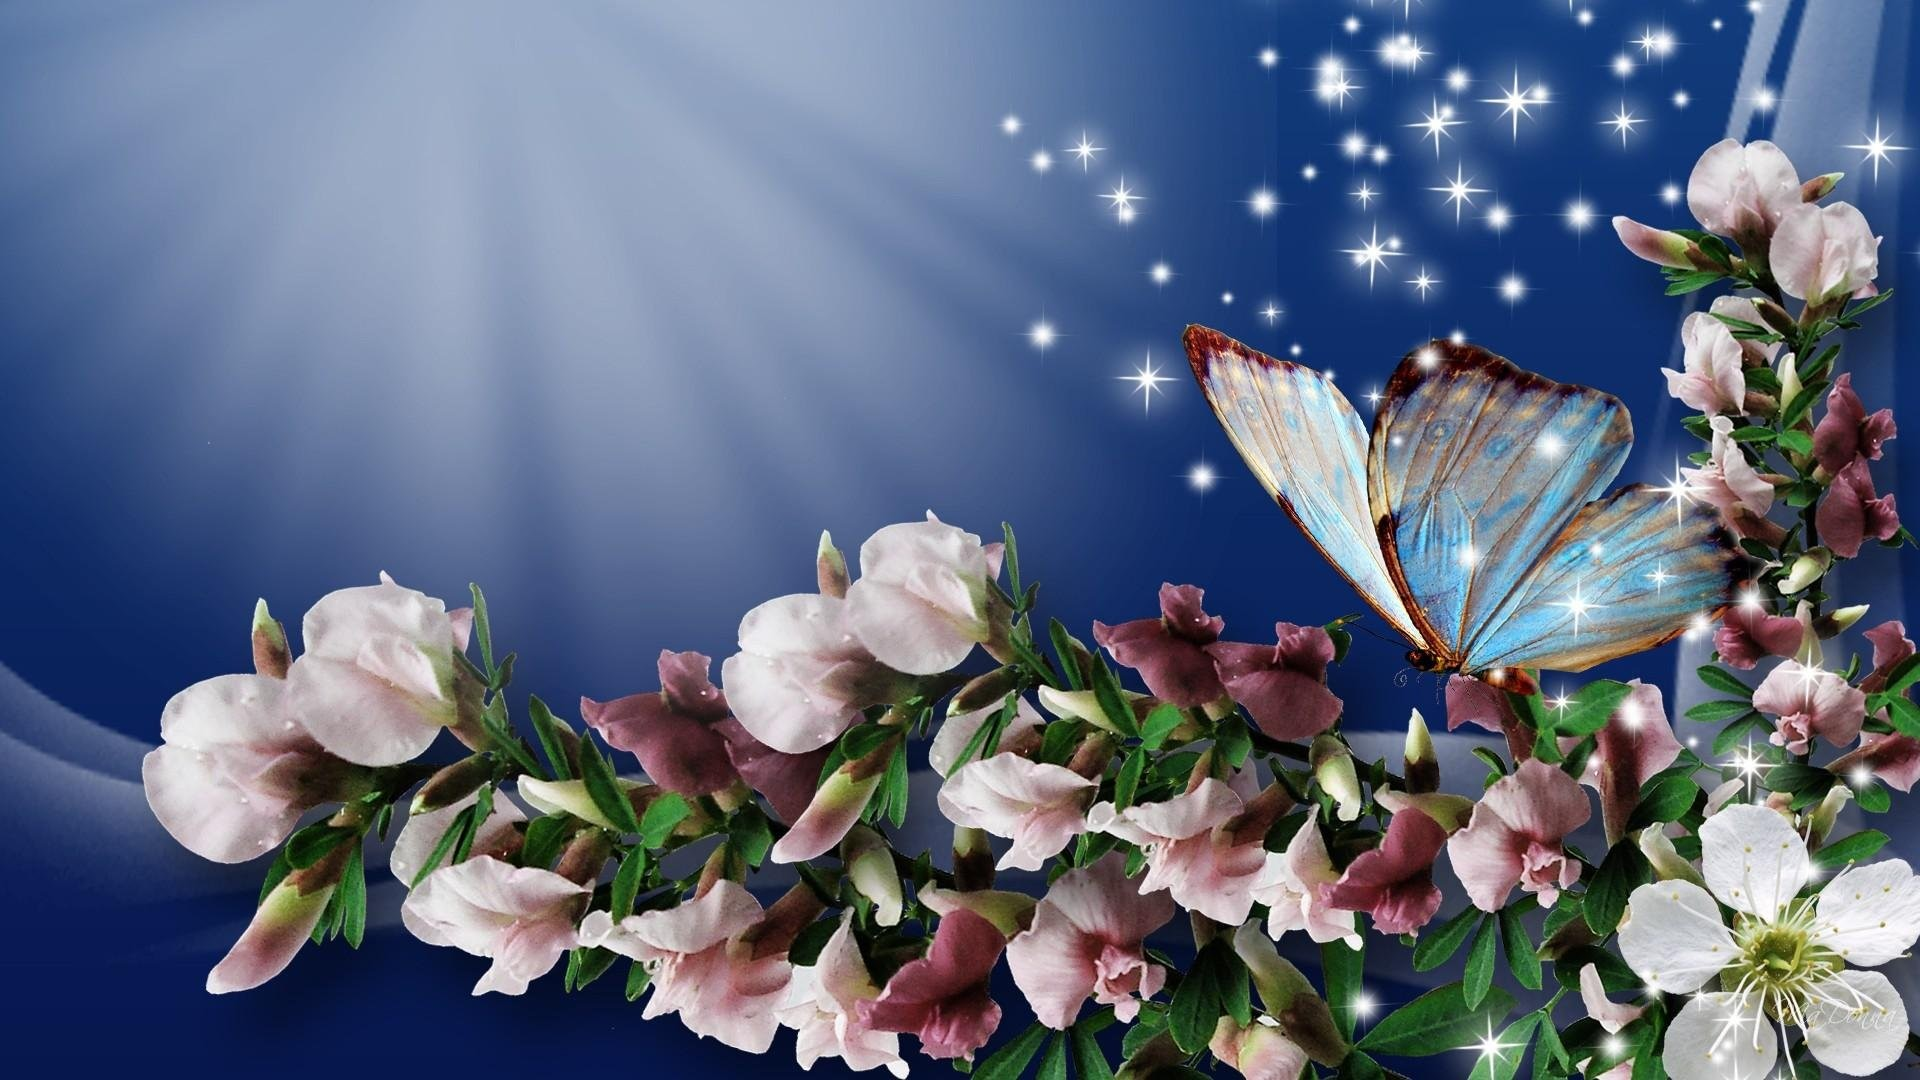 Spring Season HD desktop wallpaper : Widescreen : High Definition .